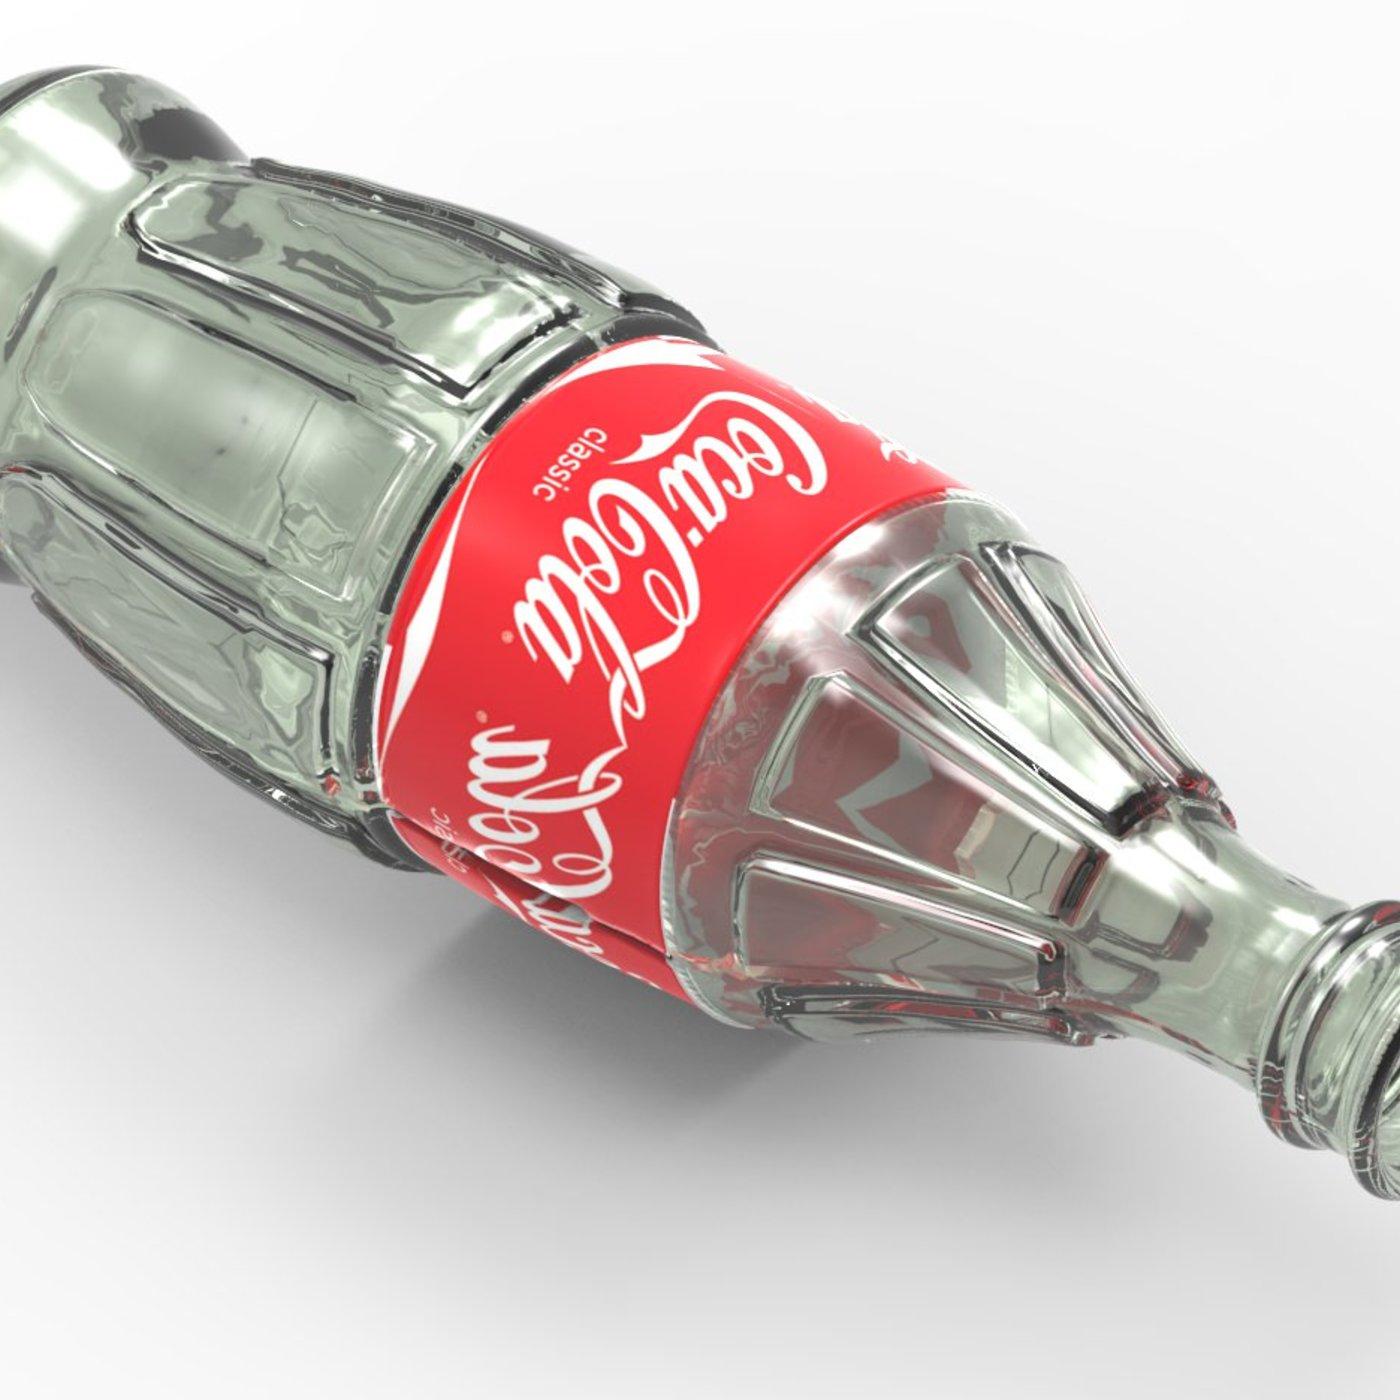 Coca Cola!